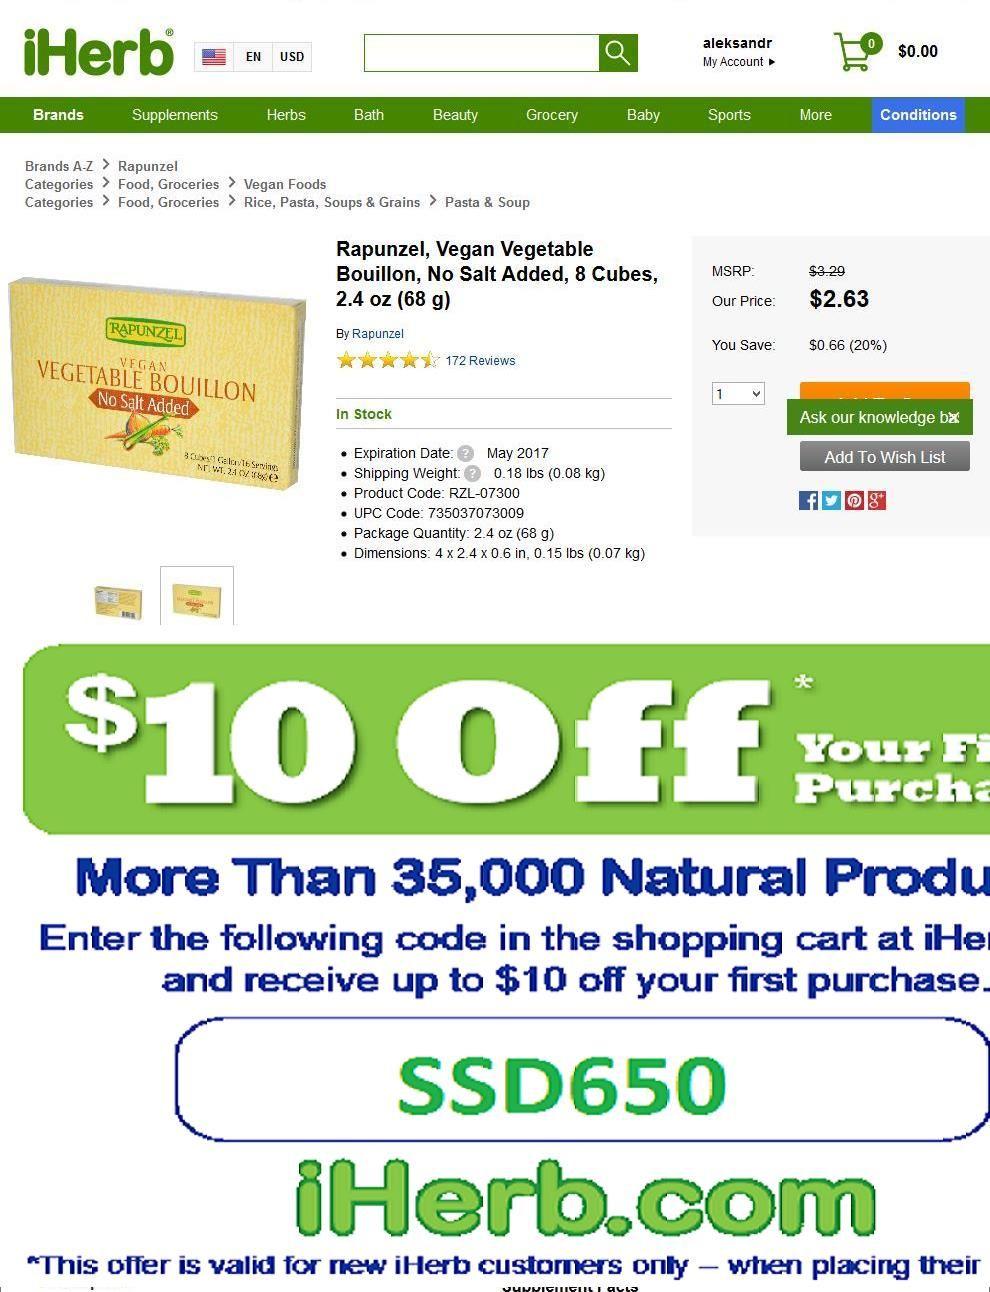 Rapunzel, Vegan Vegetable Bouillon, No Salt Added, 8 Cubes, 2.4 oz (68 g)   http://iherb.com/Rapunzel-Vegan-Vegetable-Bouillon-No-Salt-Added-8-Cubes-2-4-oz-68-g/30385